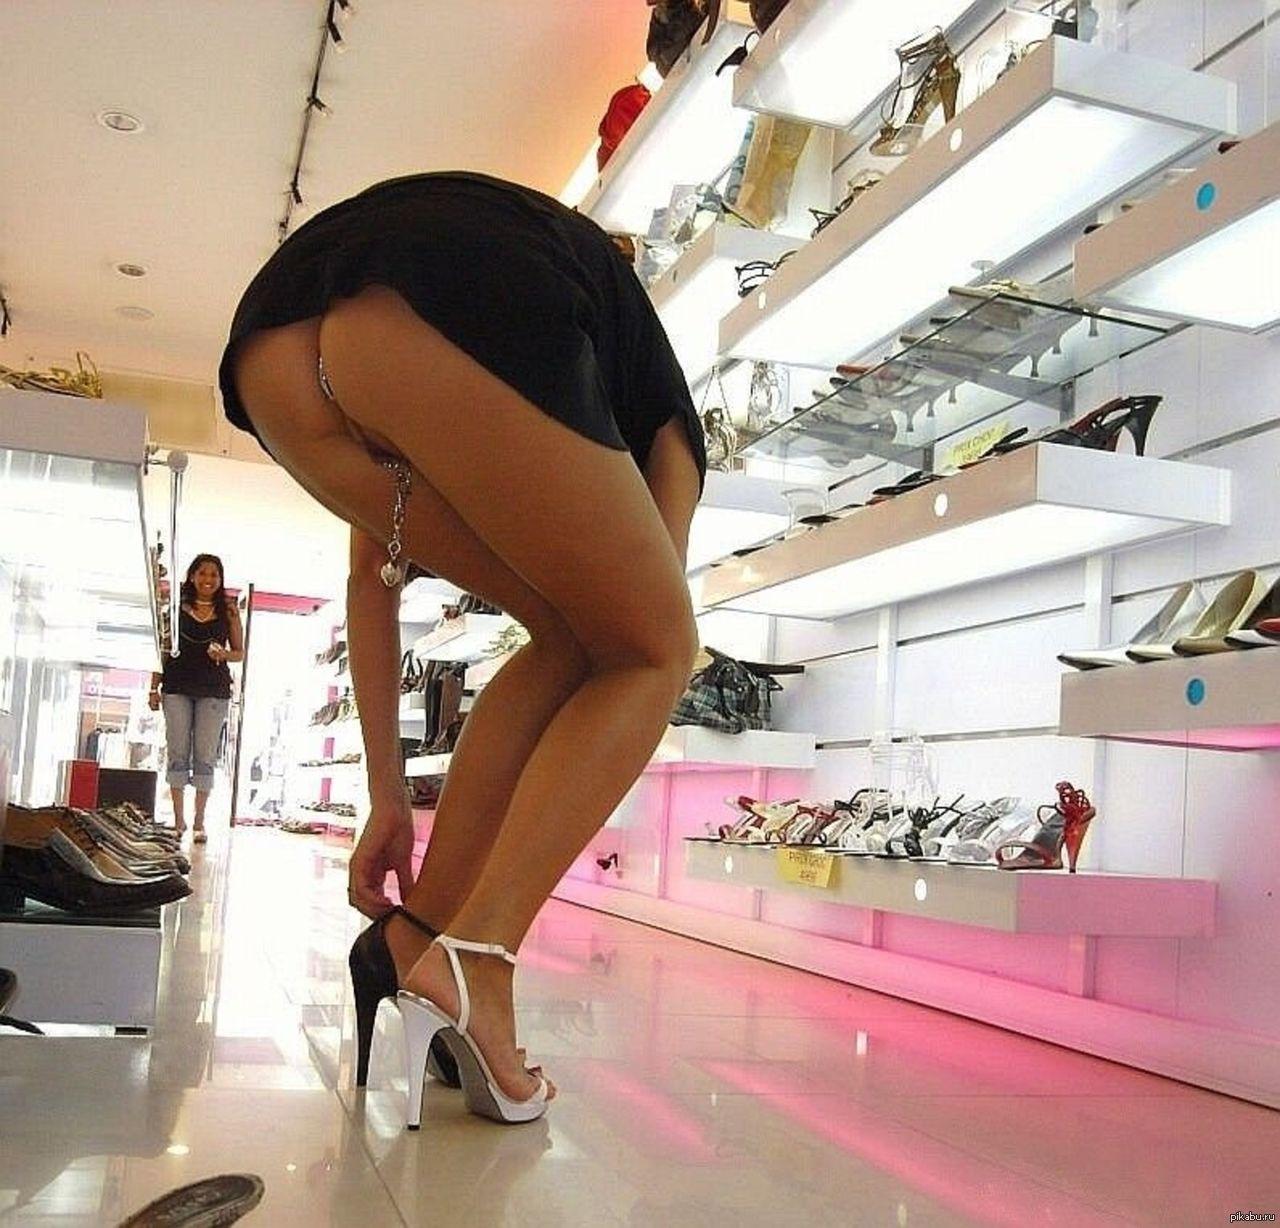 Почему девушки любят ходить без трусов